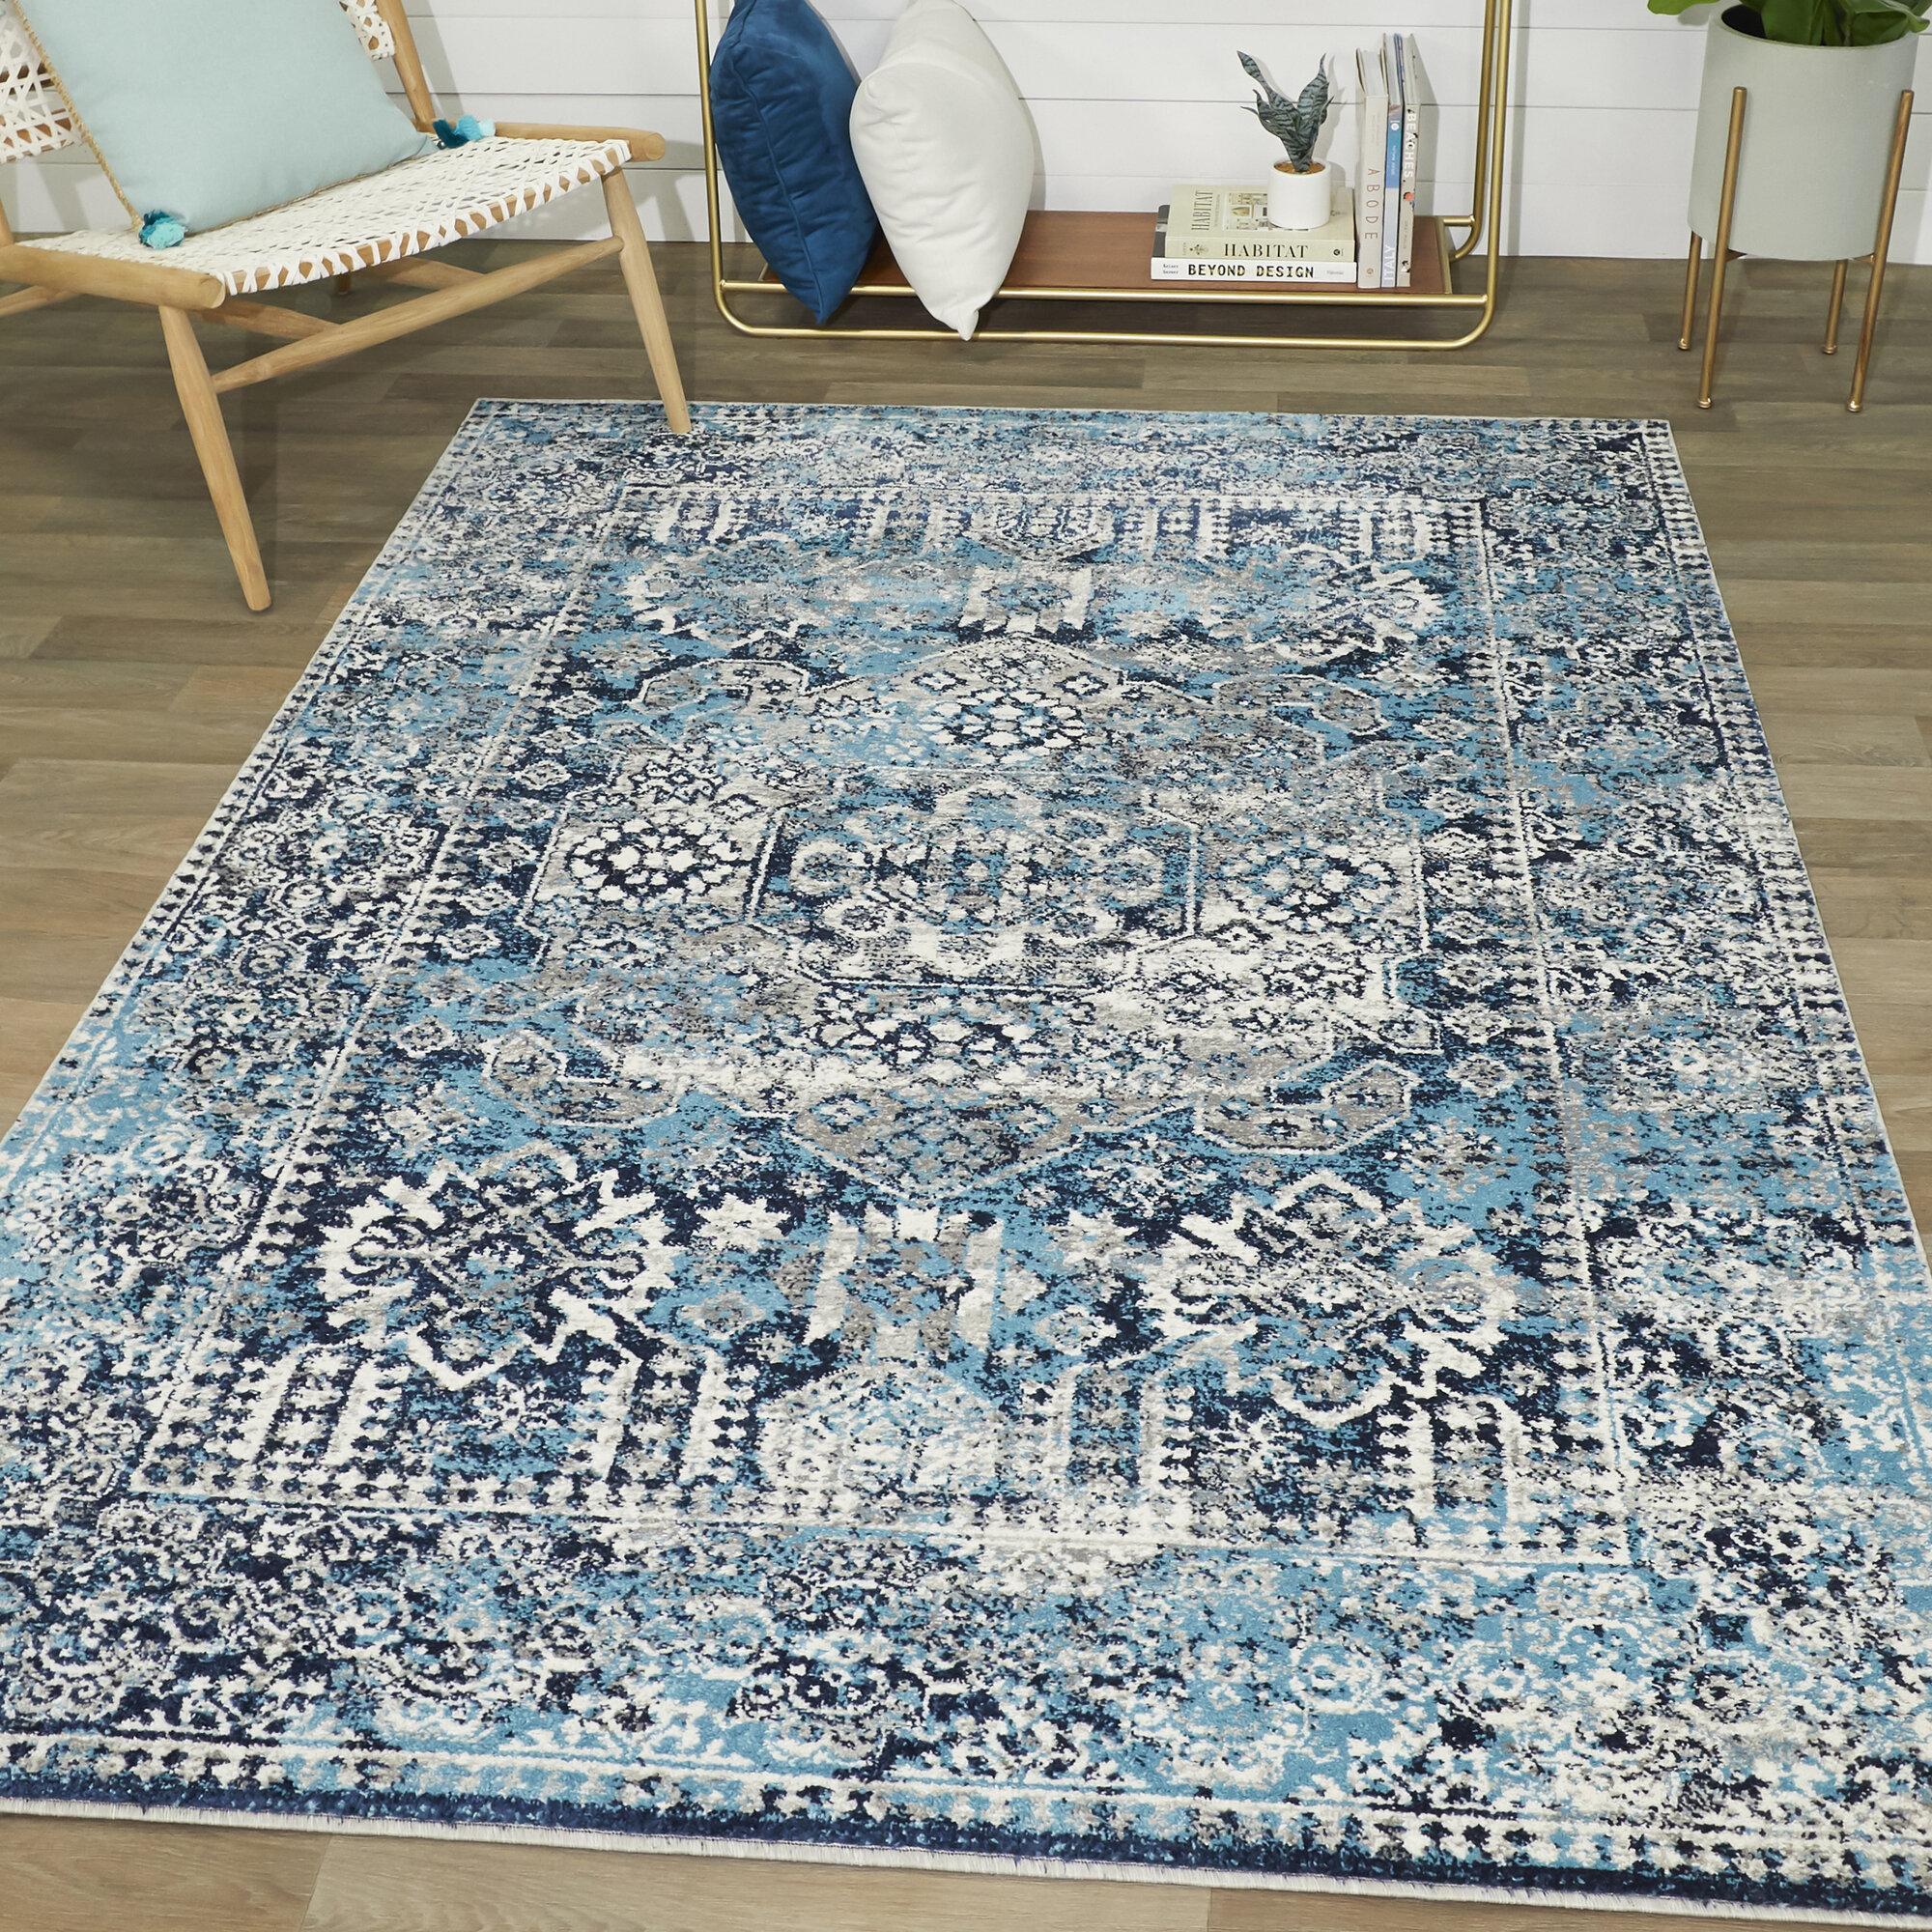 Charlton Home Fasti Oriental Blue Teal Area Rug Reviews Wayfair